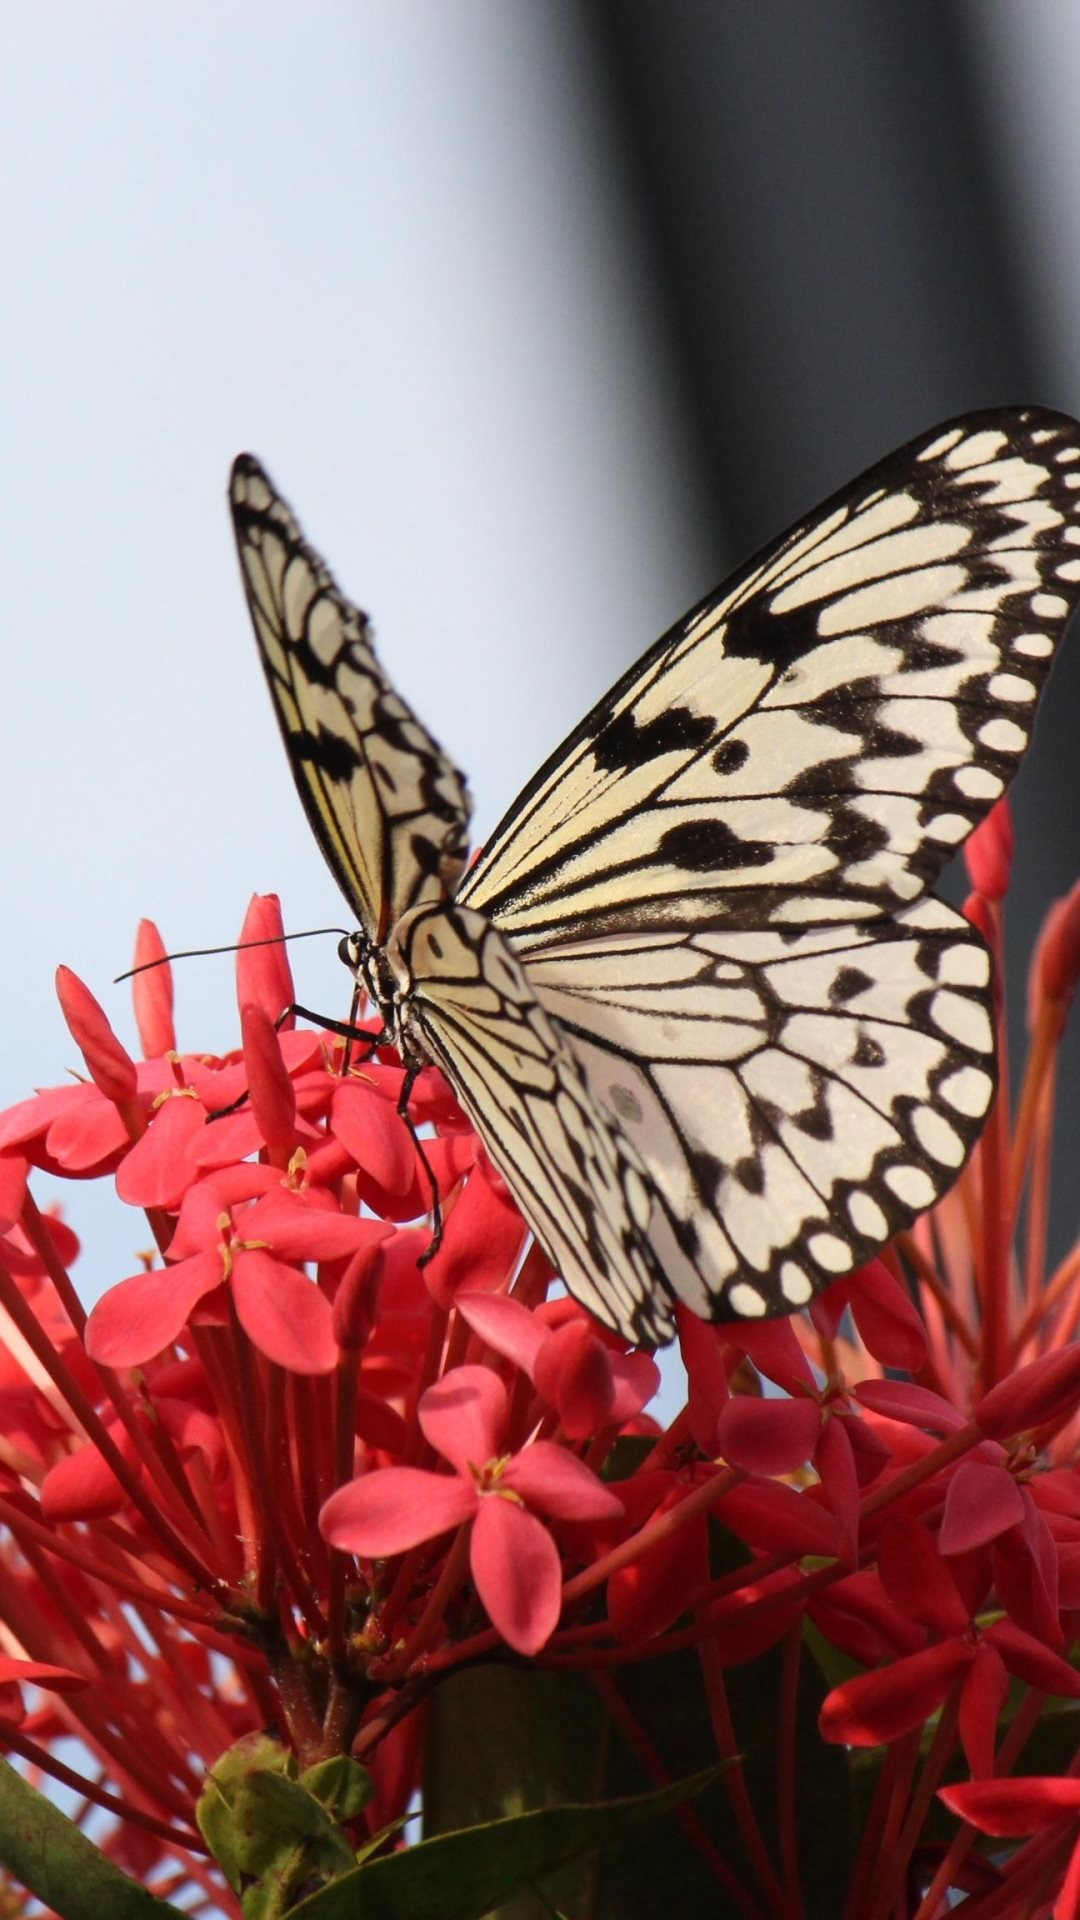 Beautiful Butterfly on Red Flower